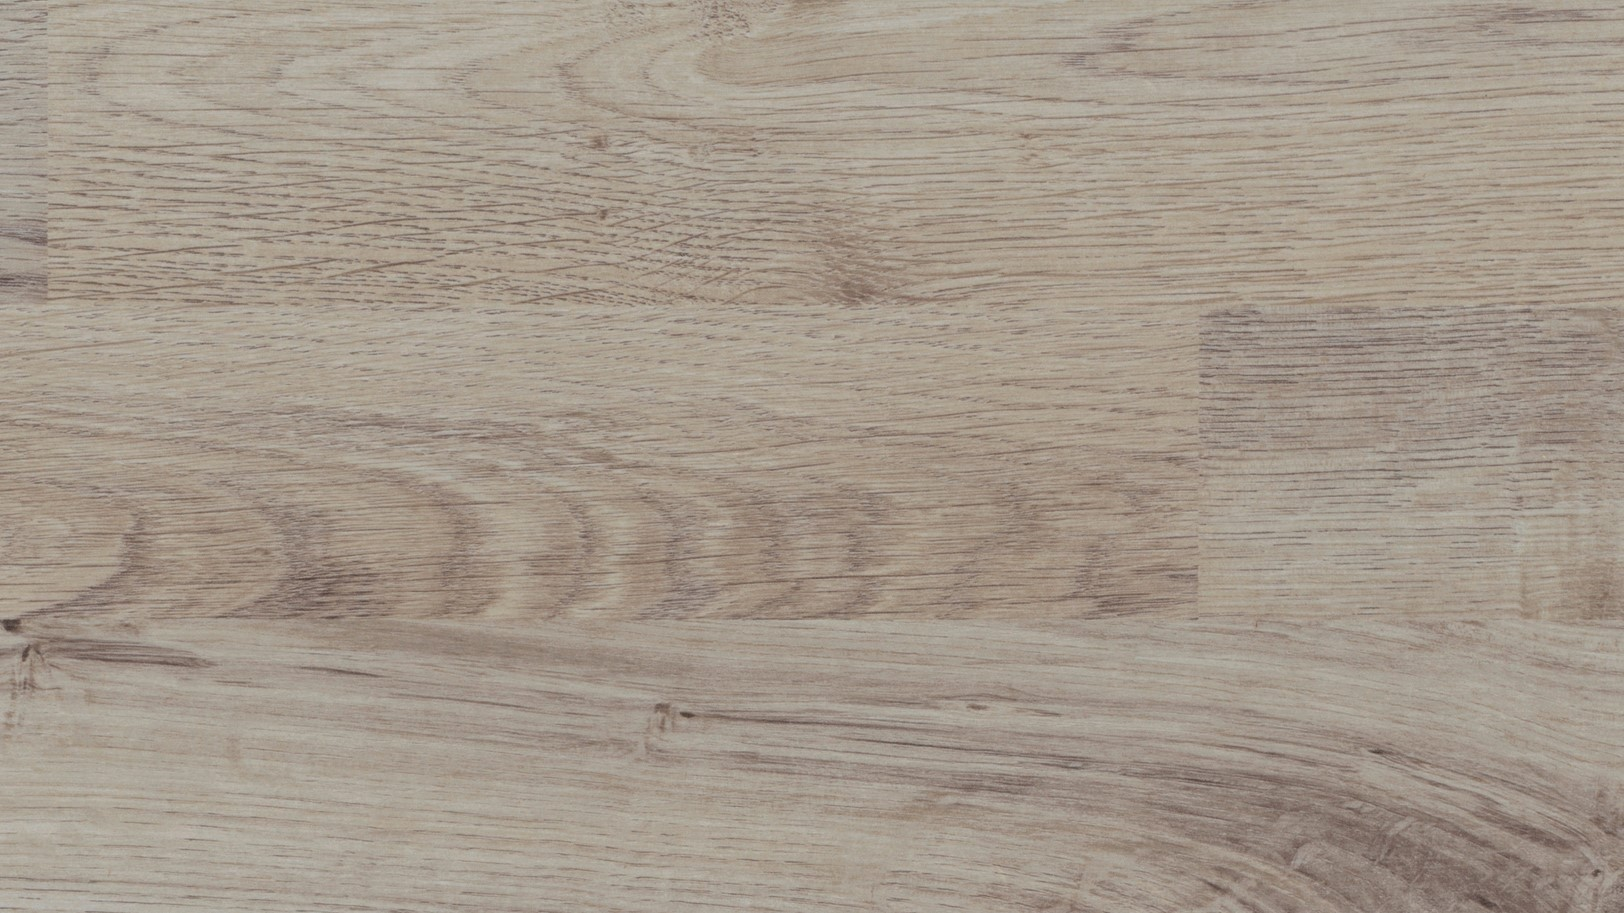 laminat eiche hell g nstig lp07 kyushucon. Black Bedroom Furniture Sets. Home Design Ideas